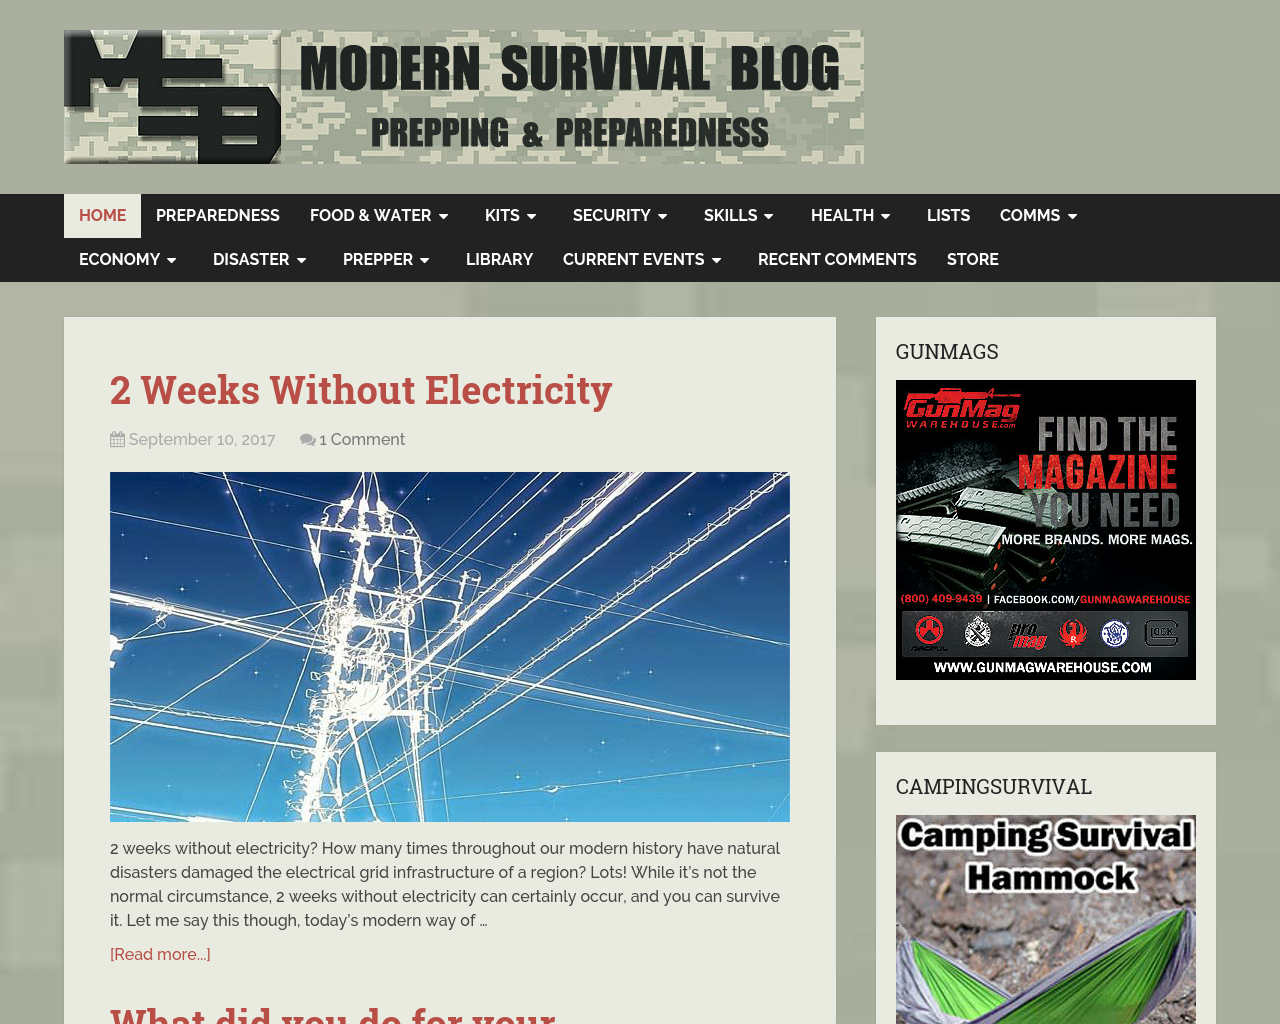 Modern-Survival-Blog-Advertising-Reviews-Pricing